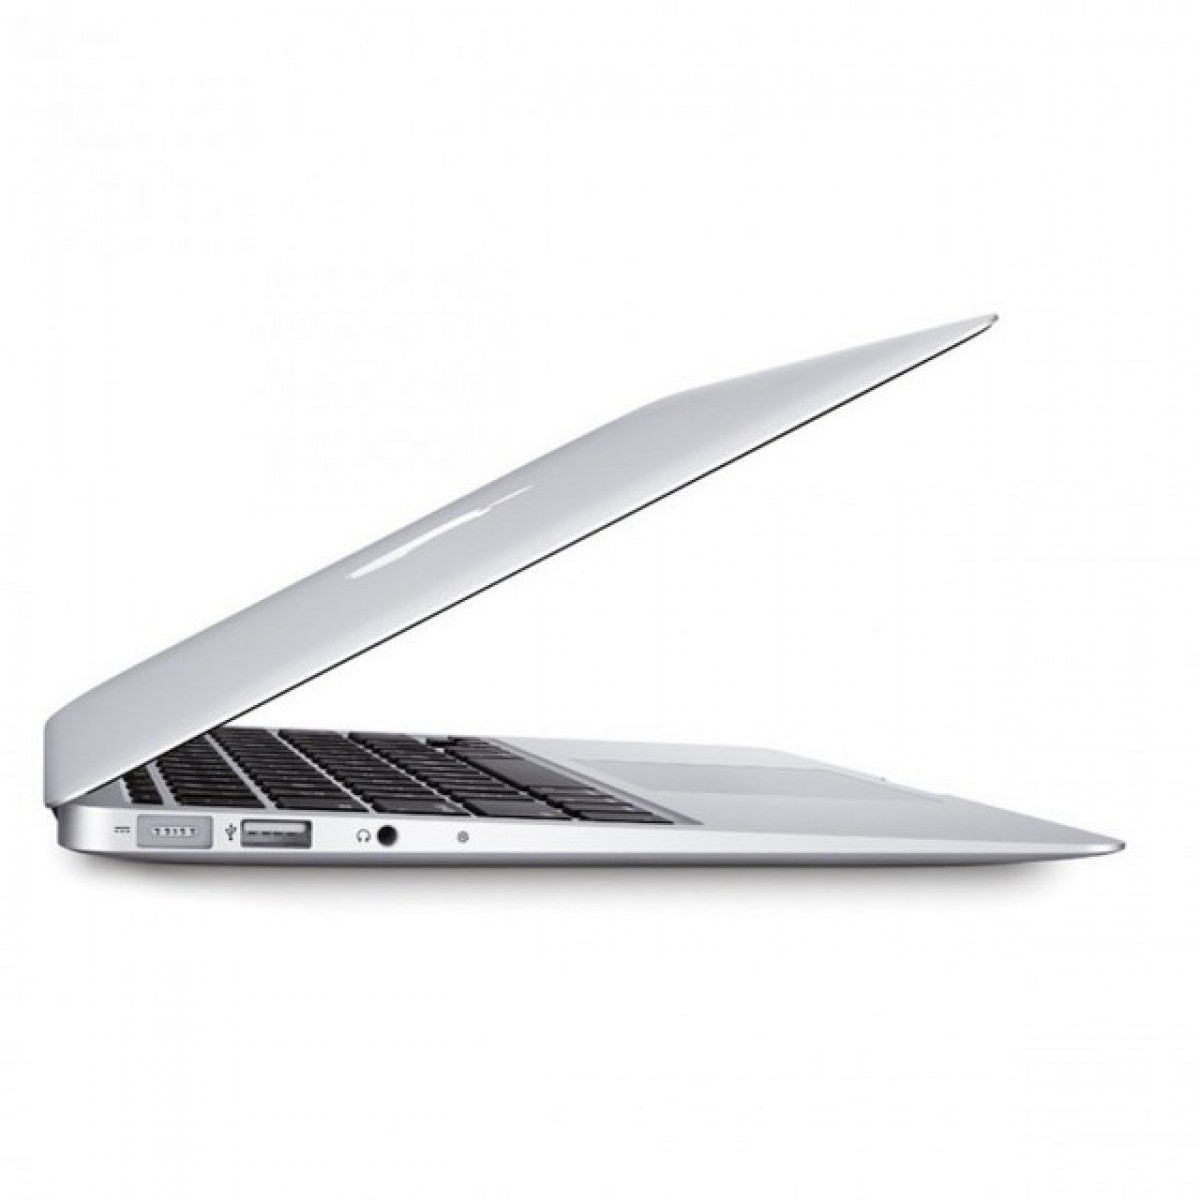 Macbook Air 2013 -11.6 Inch MD712 Core I5 4GB 256GB SSD New 99%